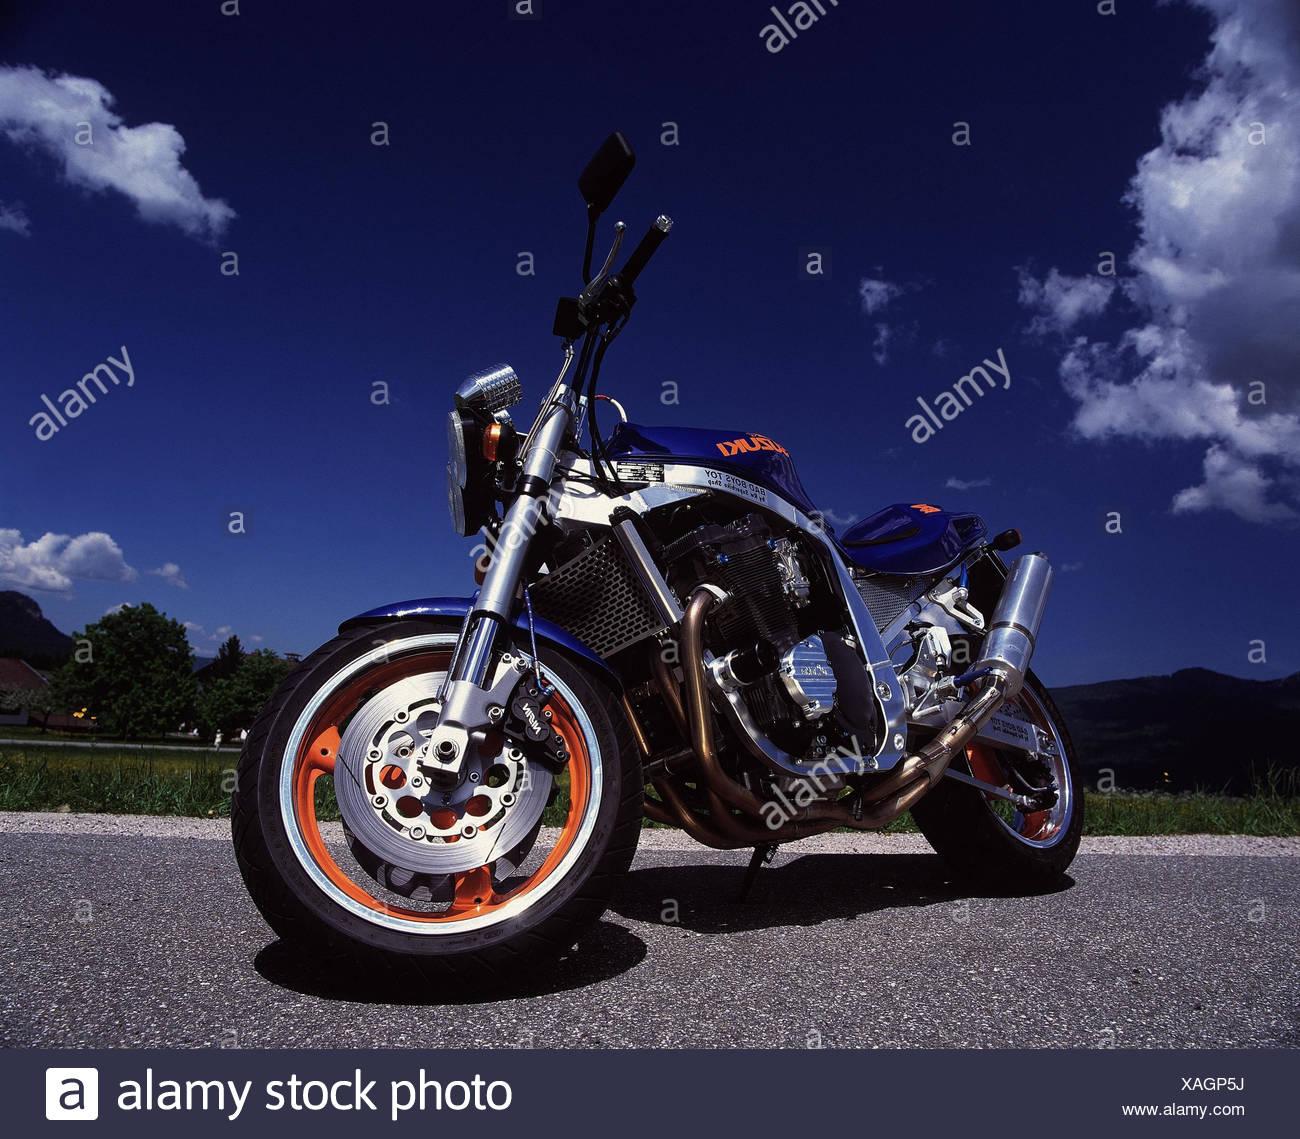 Motorcycle, Suzuki, GSX R 1100, superbike RW mood, outside, 2 force, motorcycle, automobile, motorcycle type, tuned - Stock Image